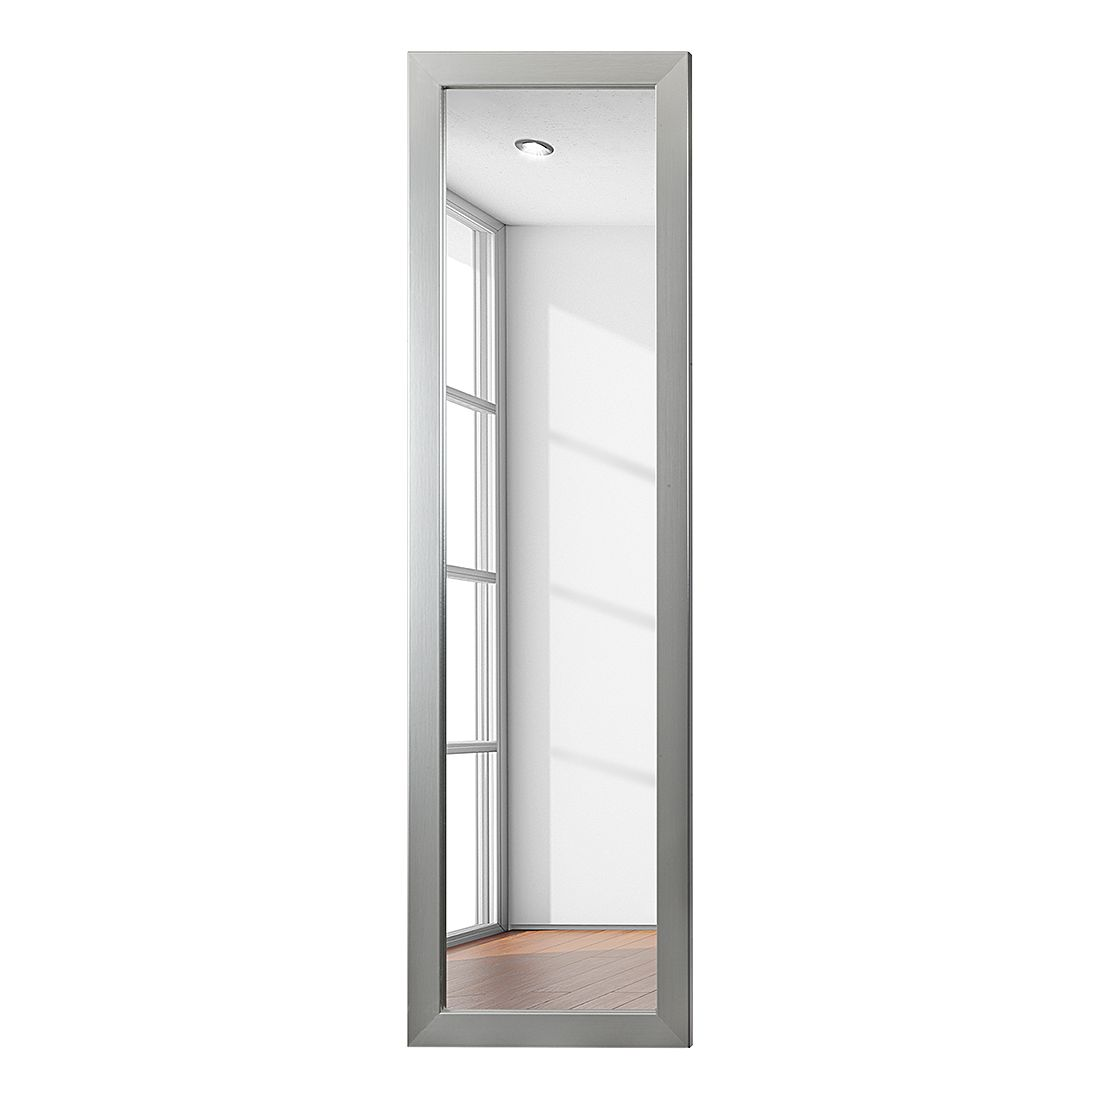 Miroir Skön II - 38 x 128 cm - Aspect acier inoxydable, roomscape